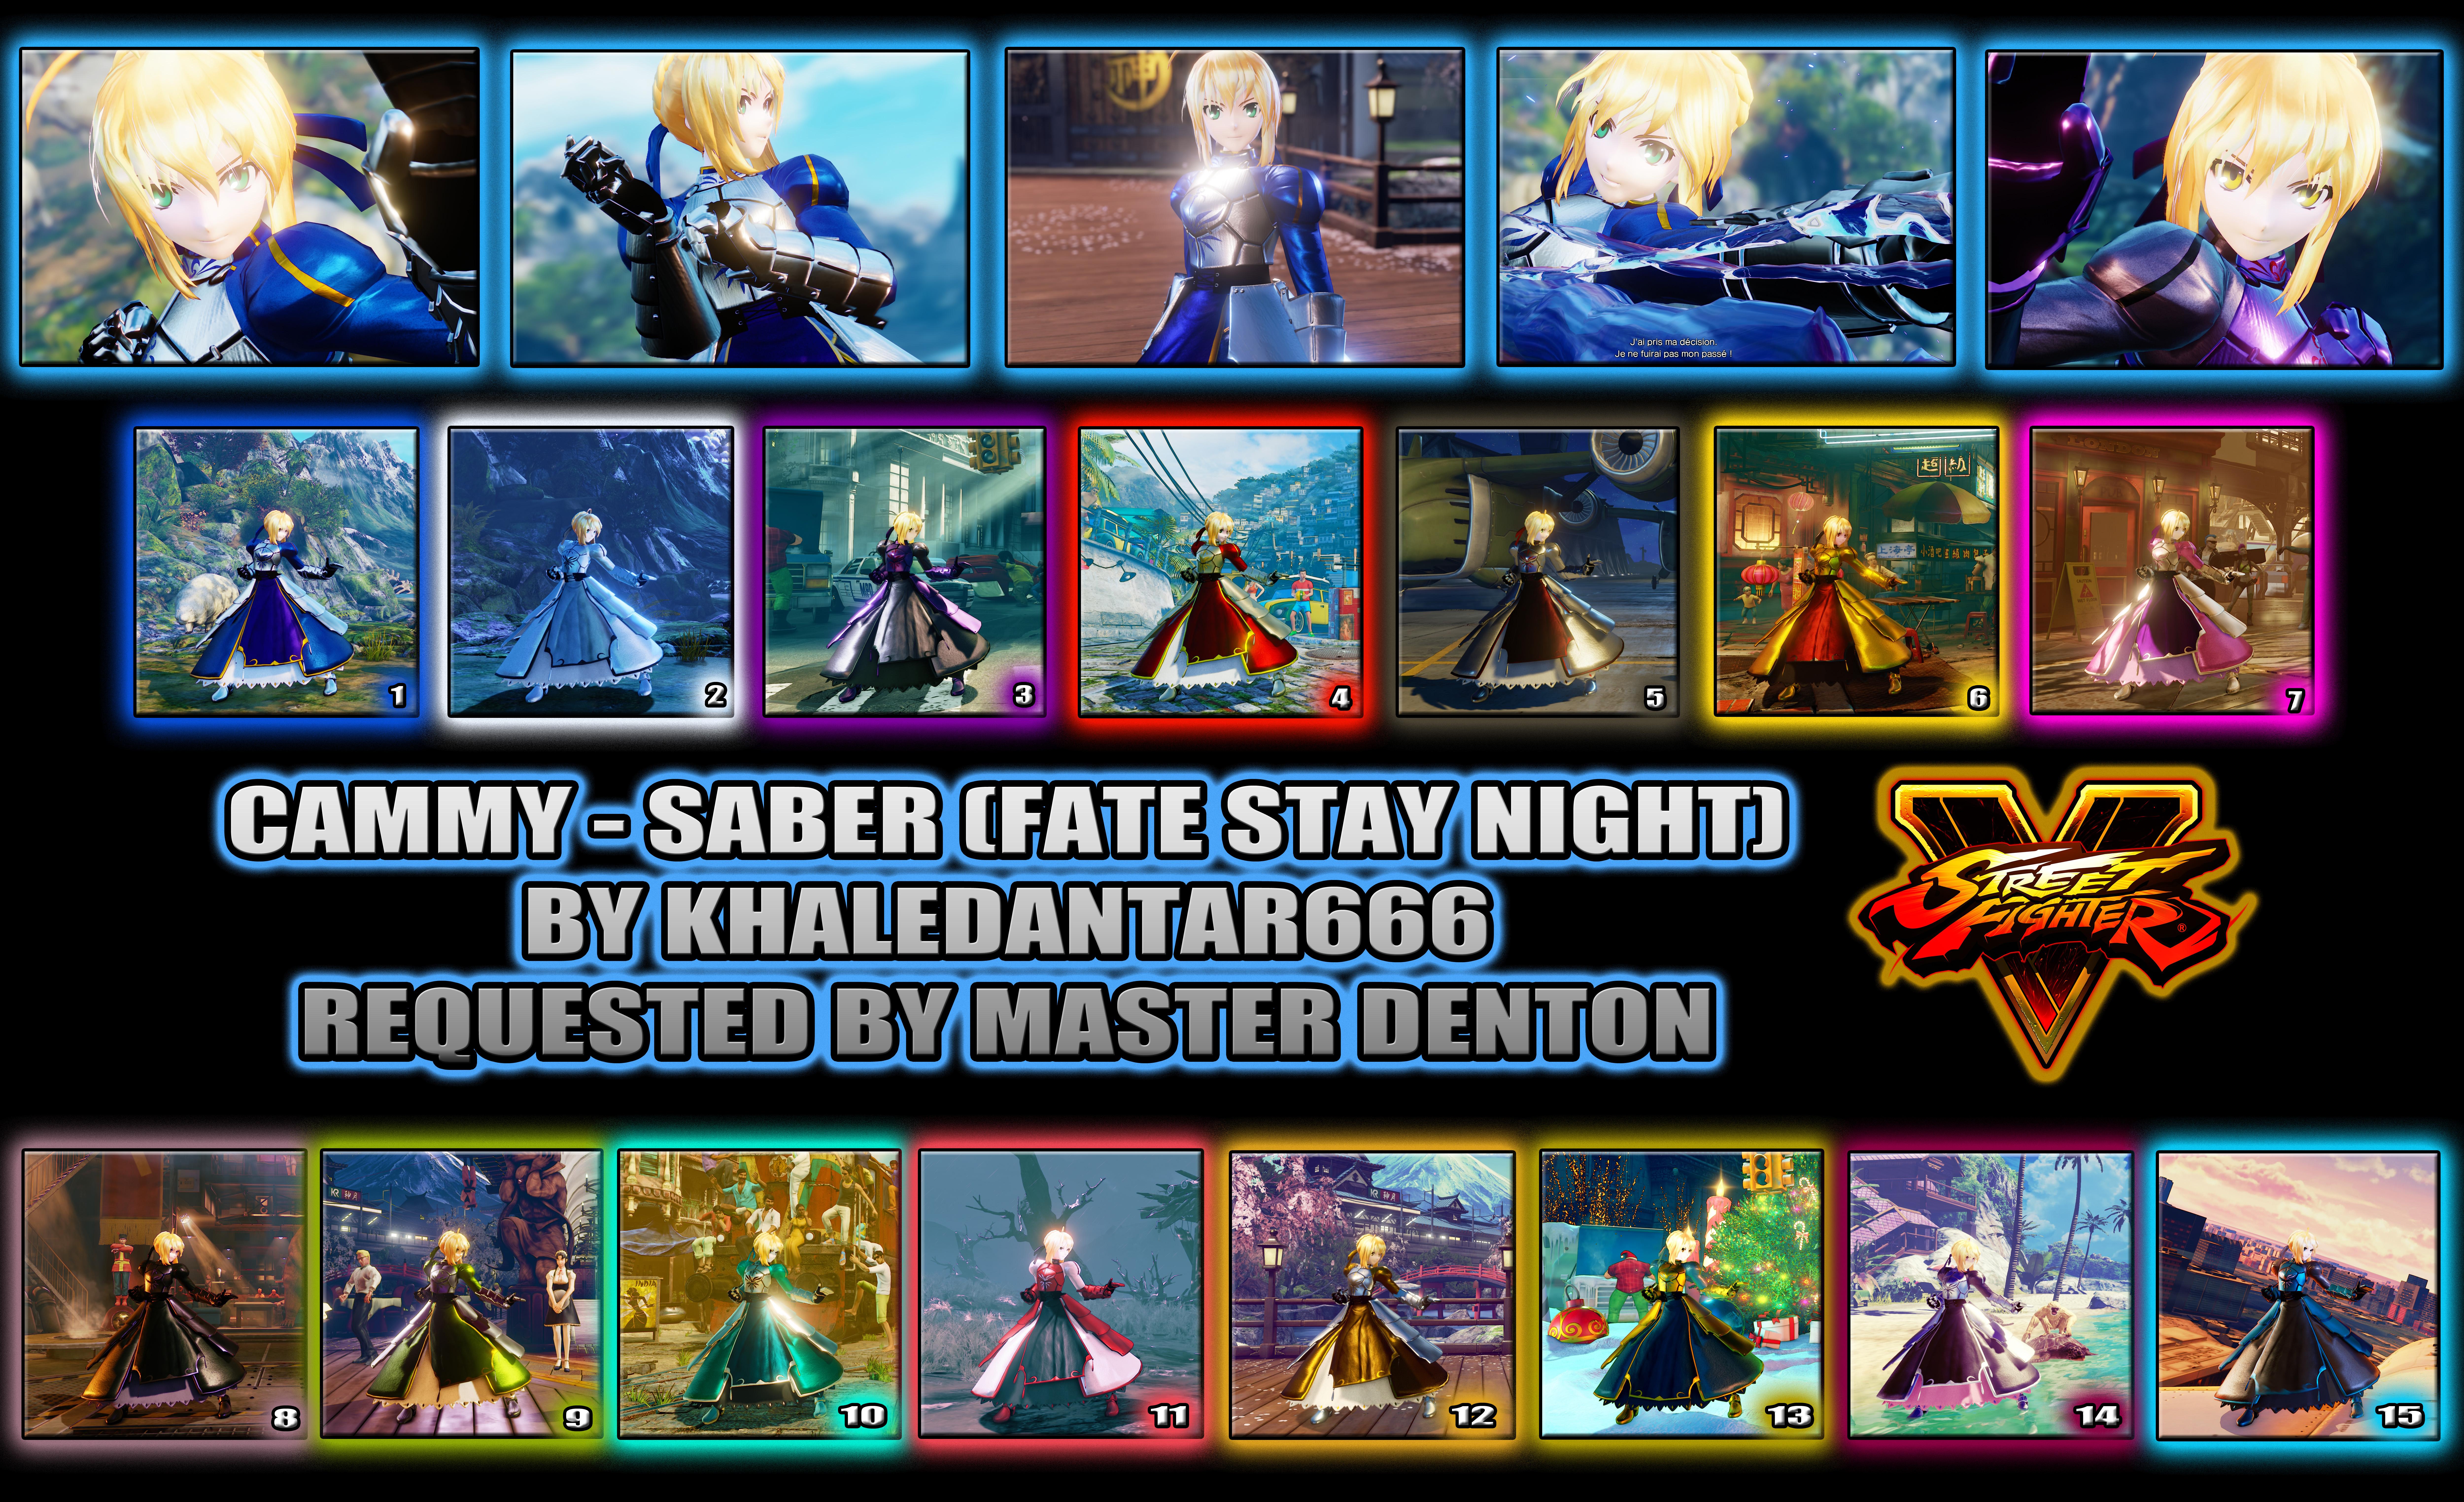 saber_preview_by_khaledantar666-db6is3f.jpg